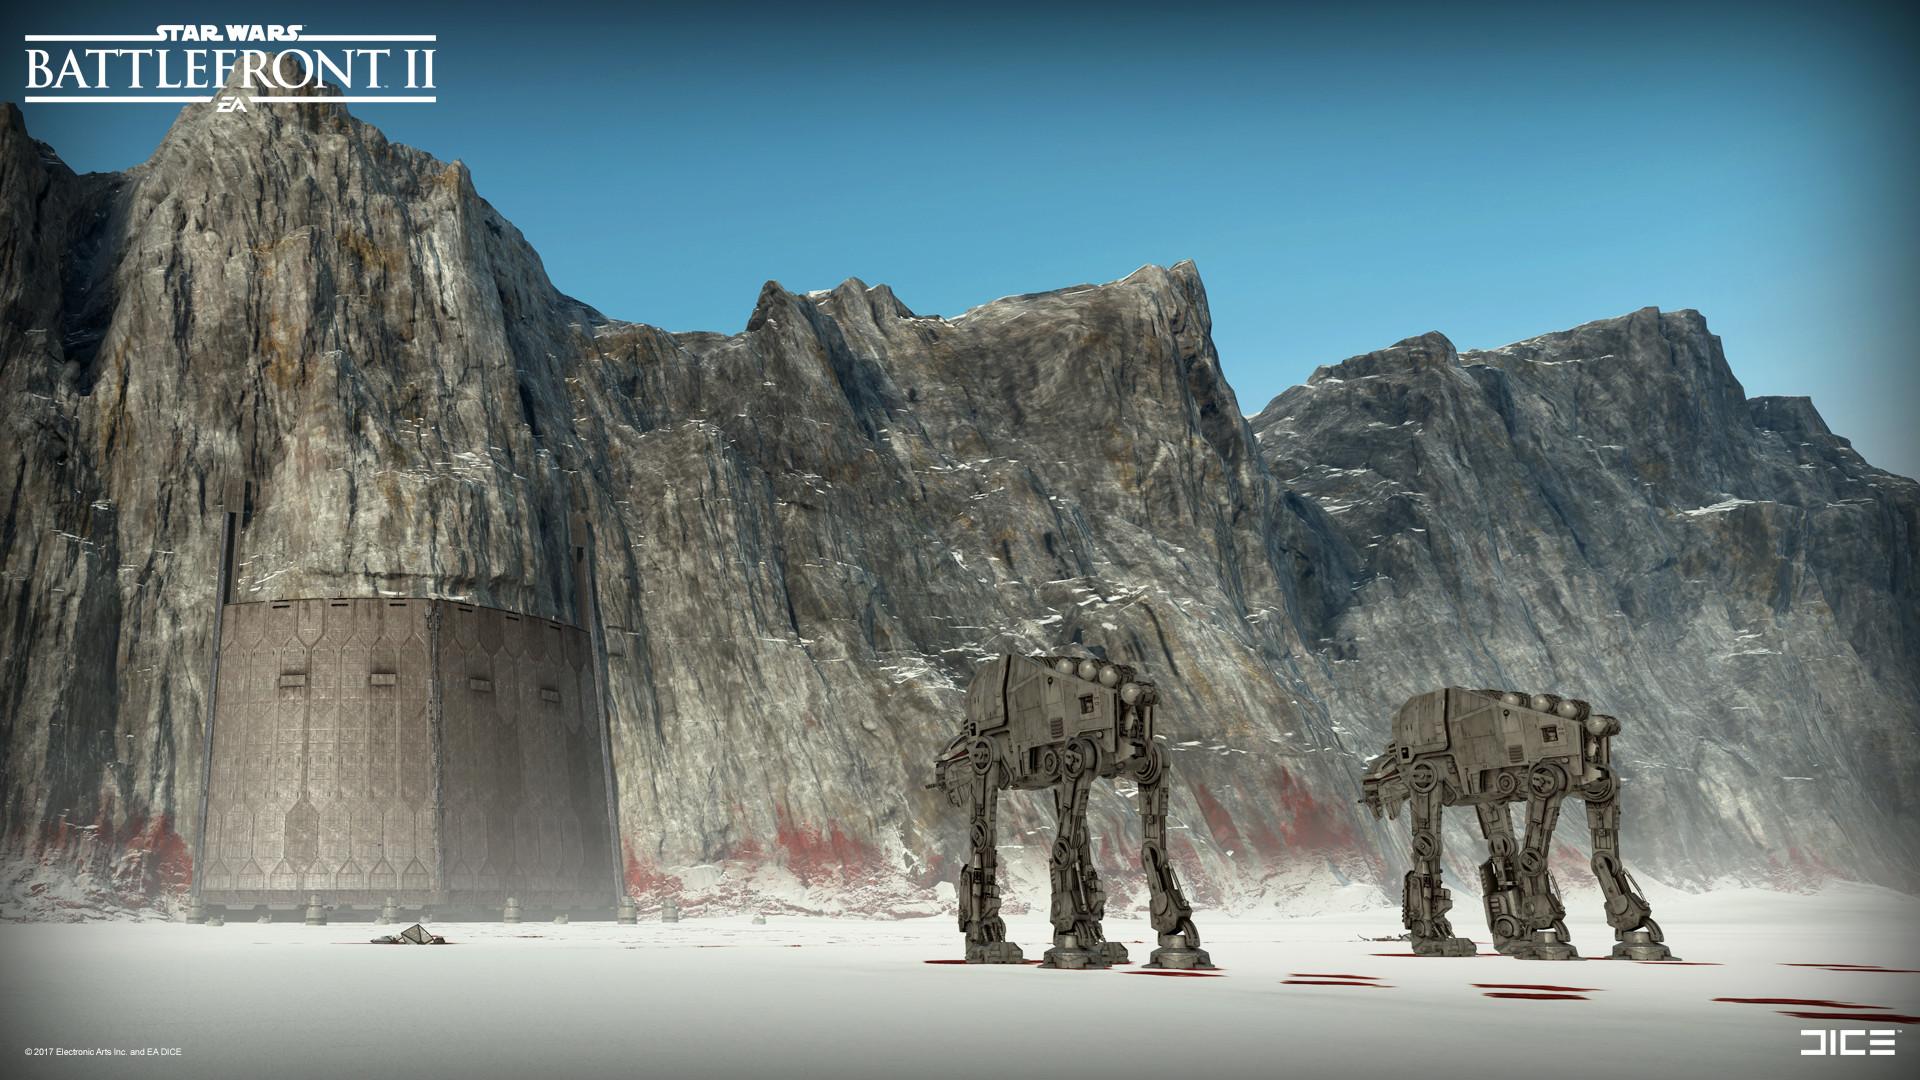 Risultati immagini per star wars battlefront 2 crait